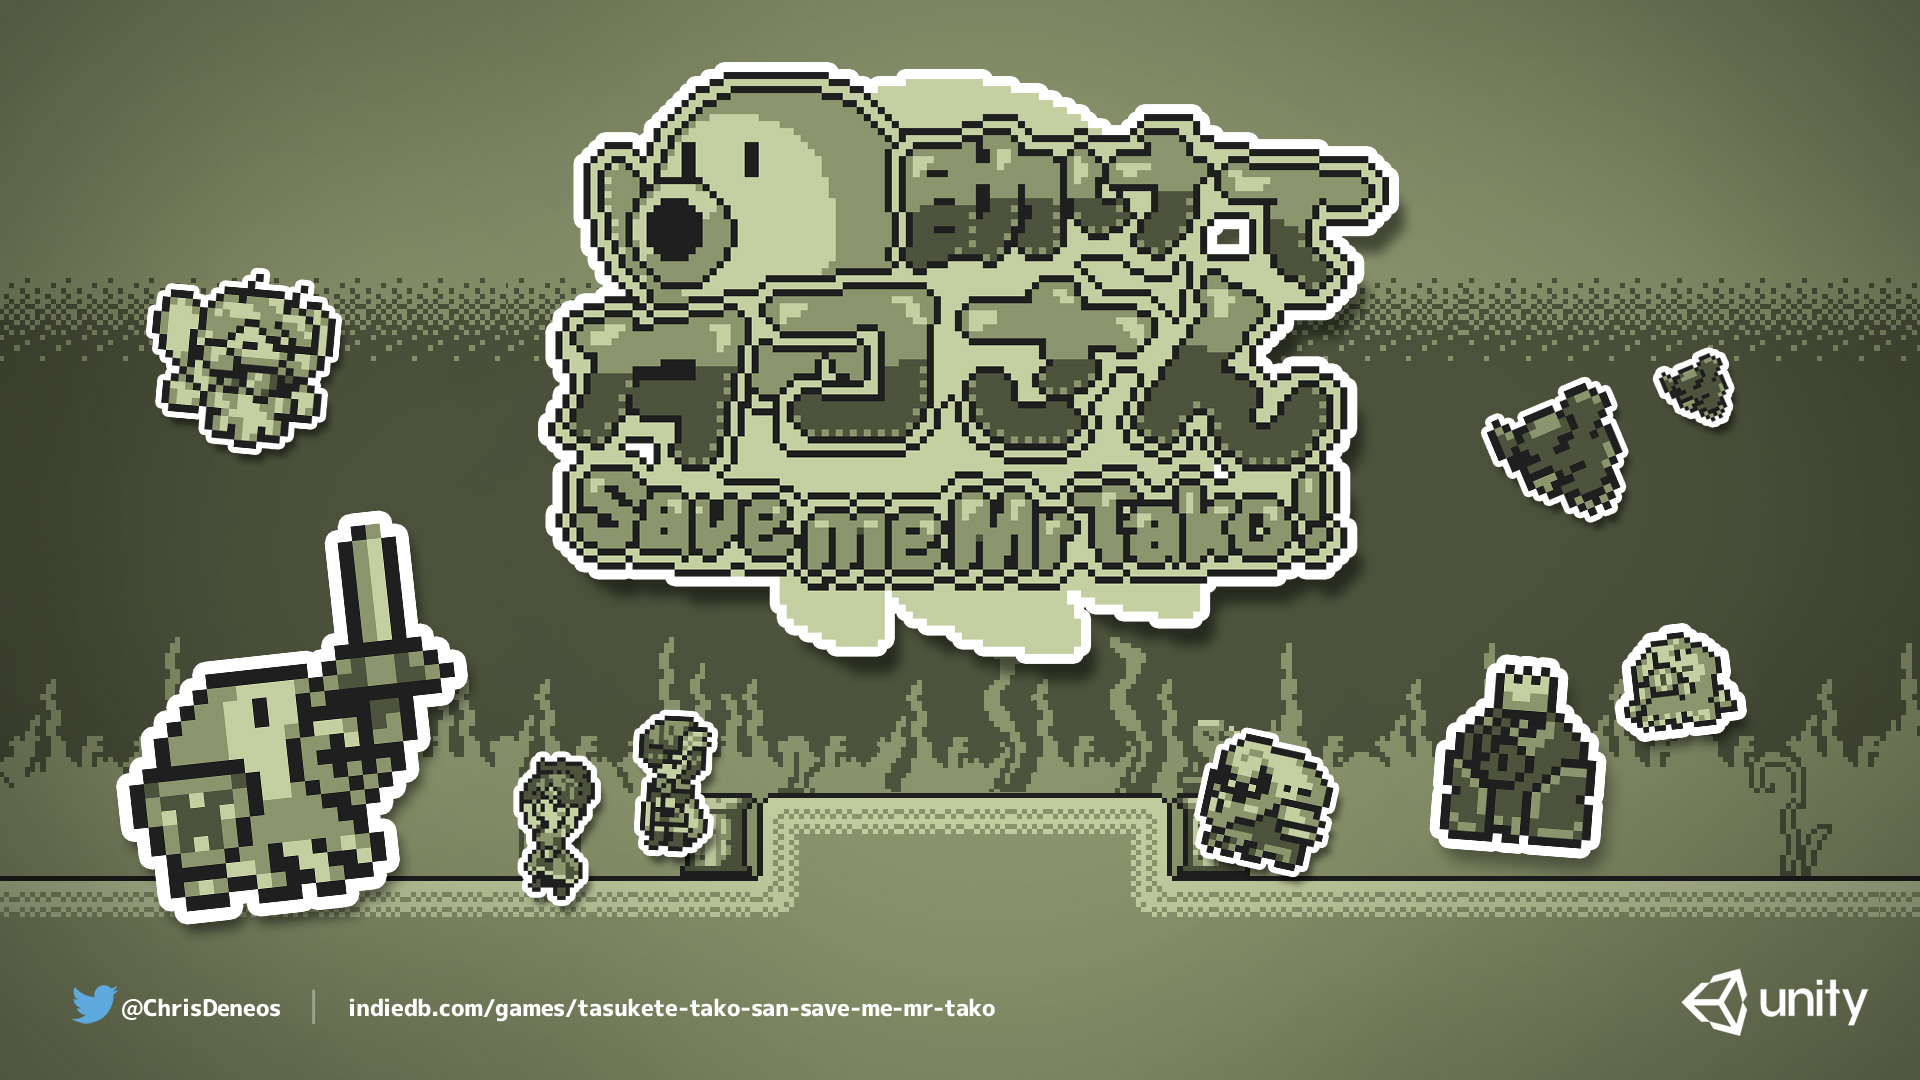 [Unity] Tasukete Tako-San : Save me Mr Tako (demo !) - Page 3 Affiche-tako2-4c86755